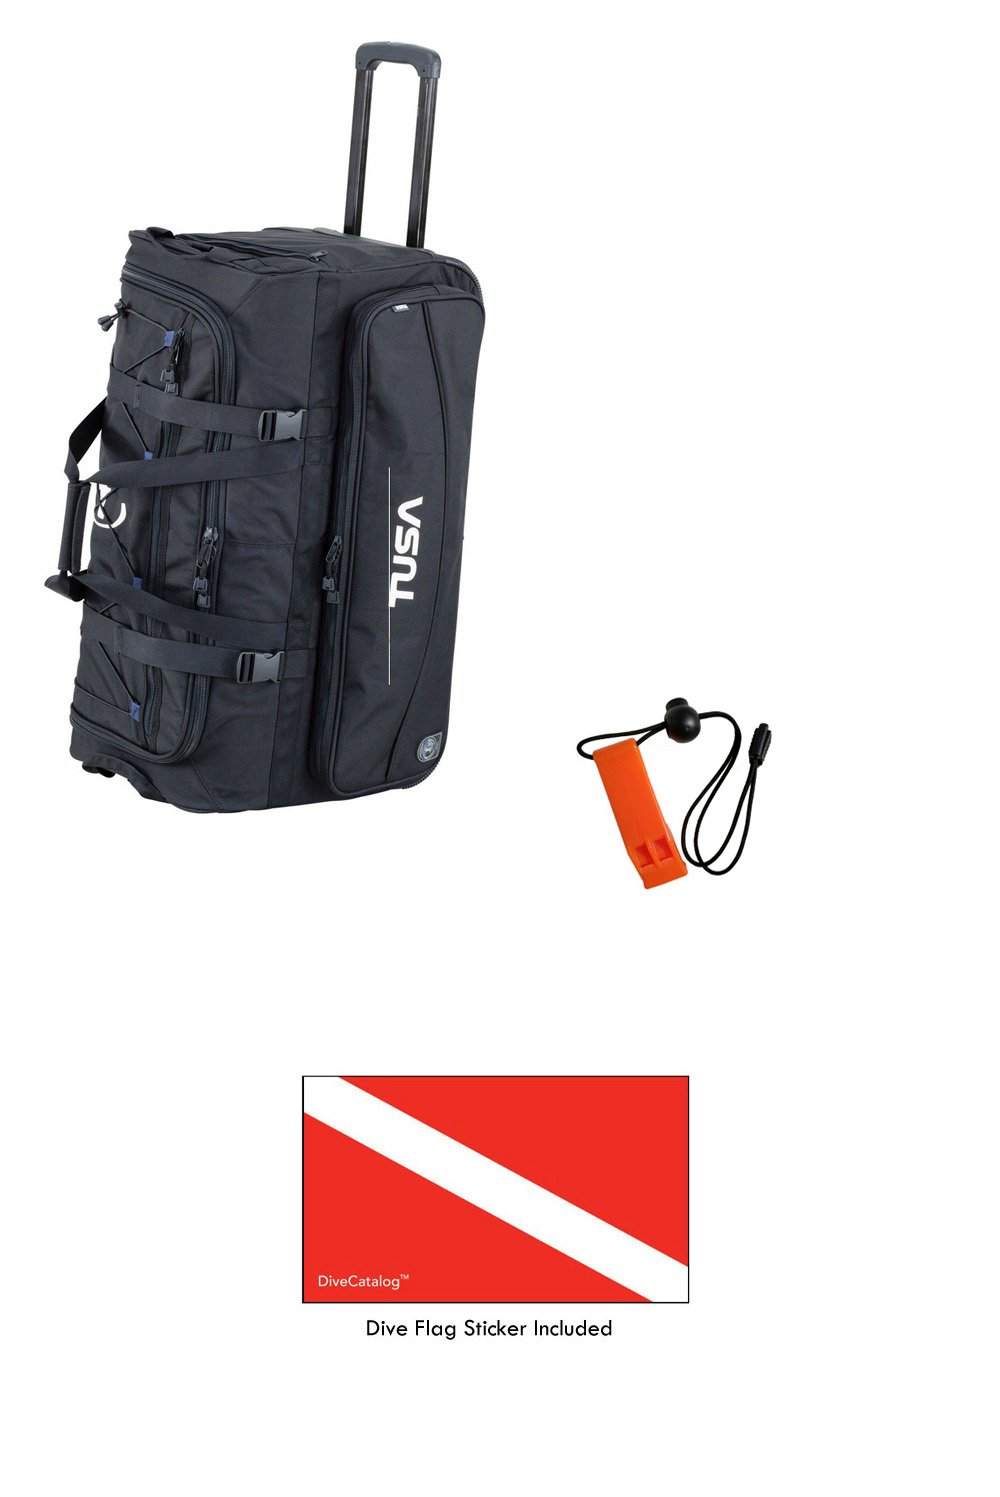 TUSA Dive Gear Roller Duffle Bag in Black & DiveCatalog's Orange Whistle w/Lanyard & Dive Flag Sticker by TUSA